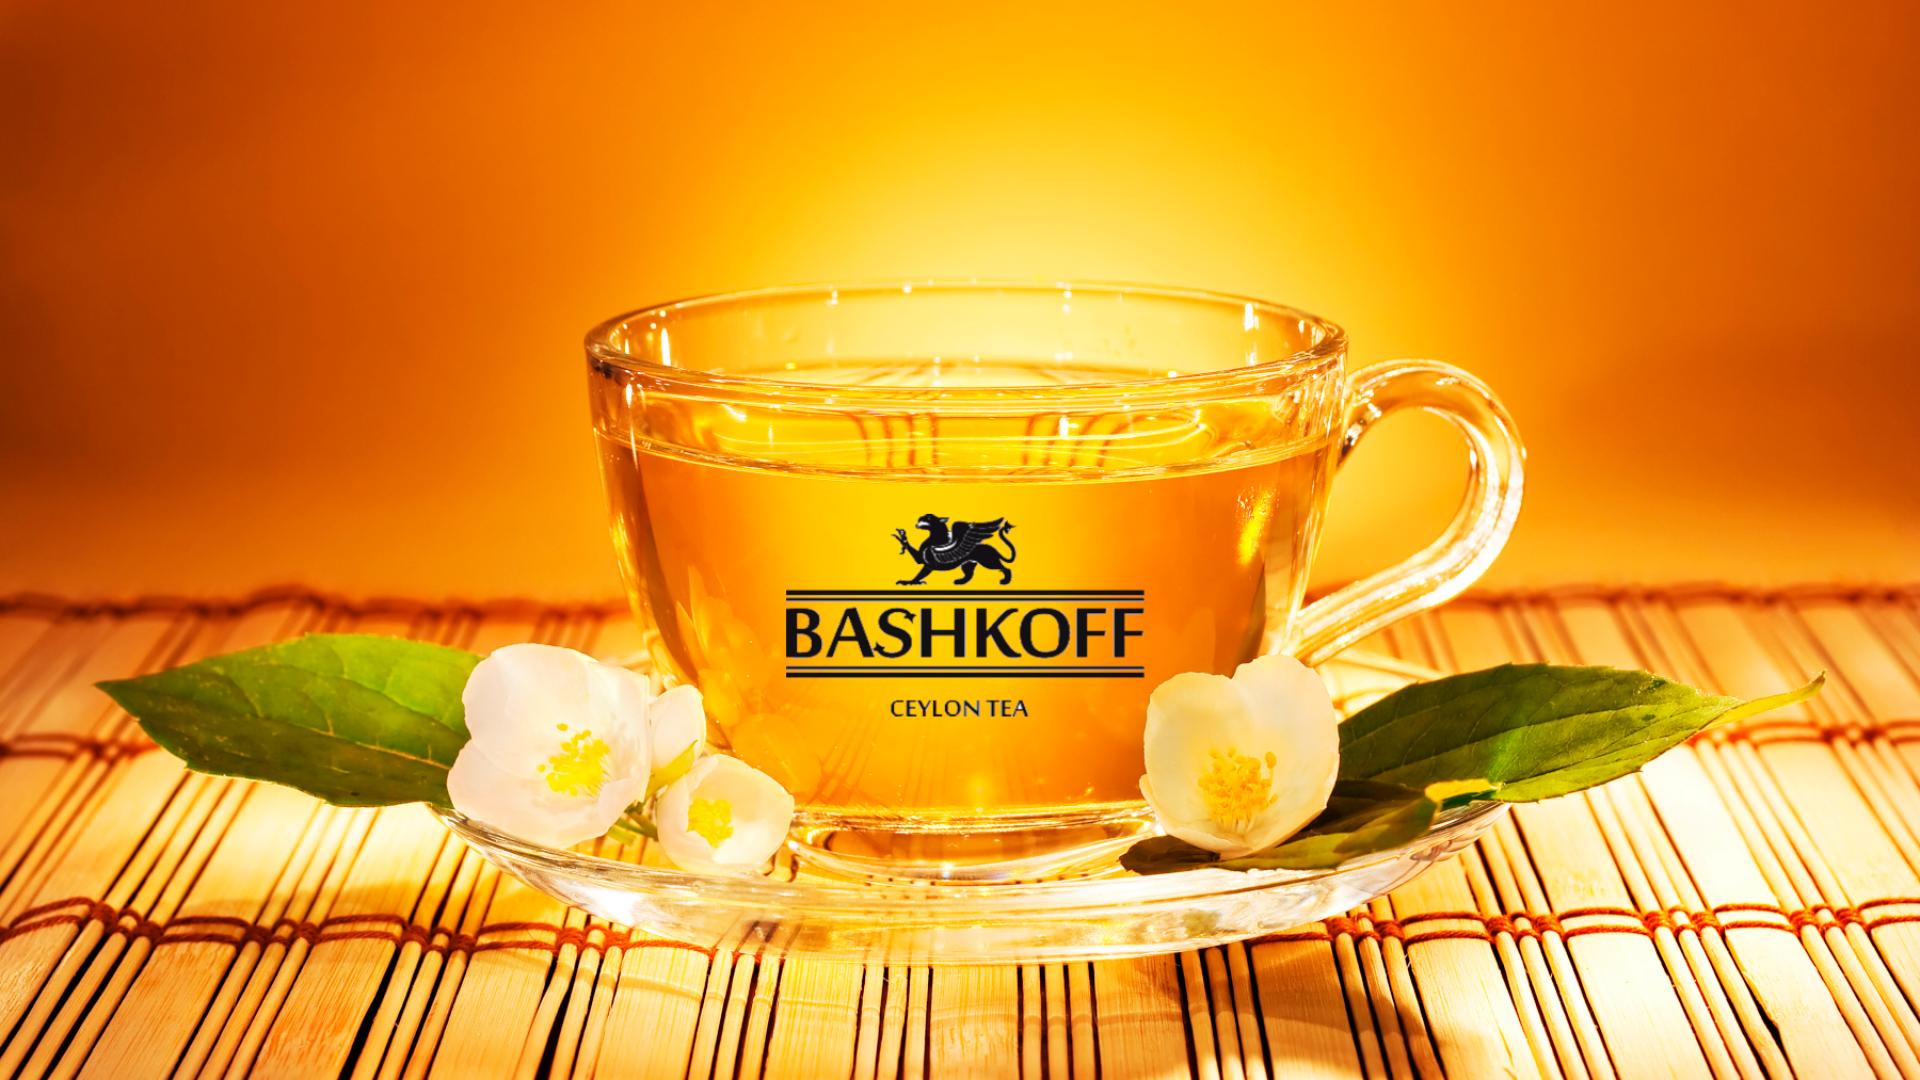 Bashkoff Tea